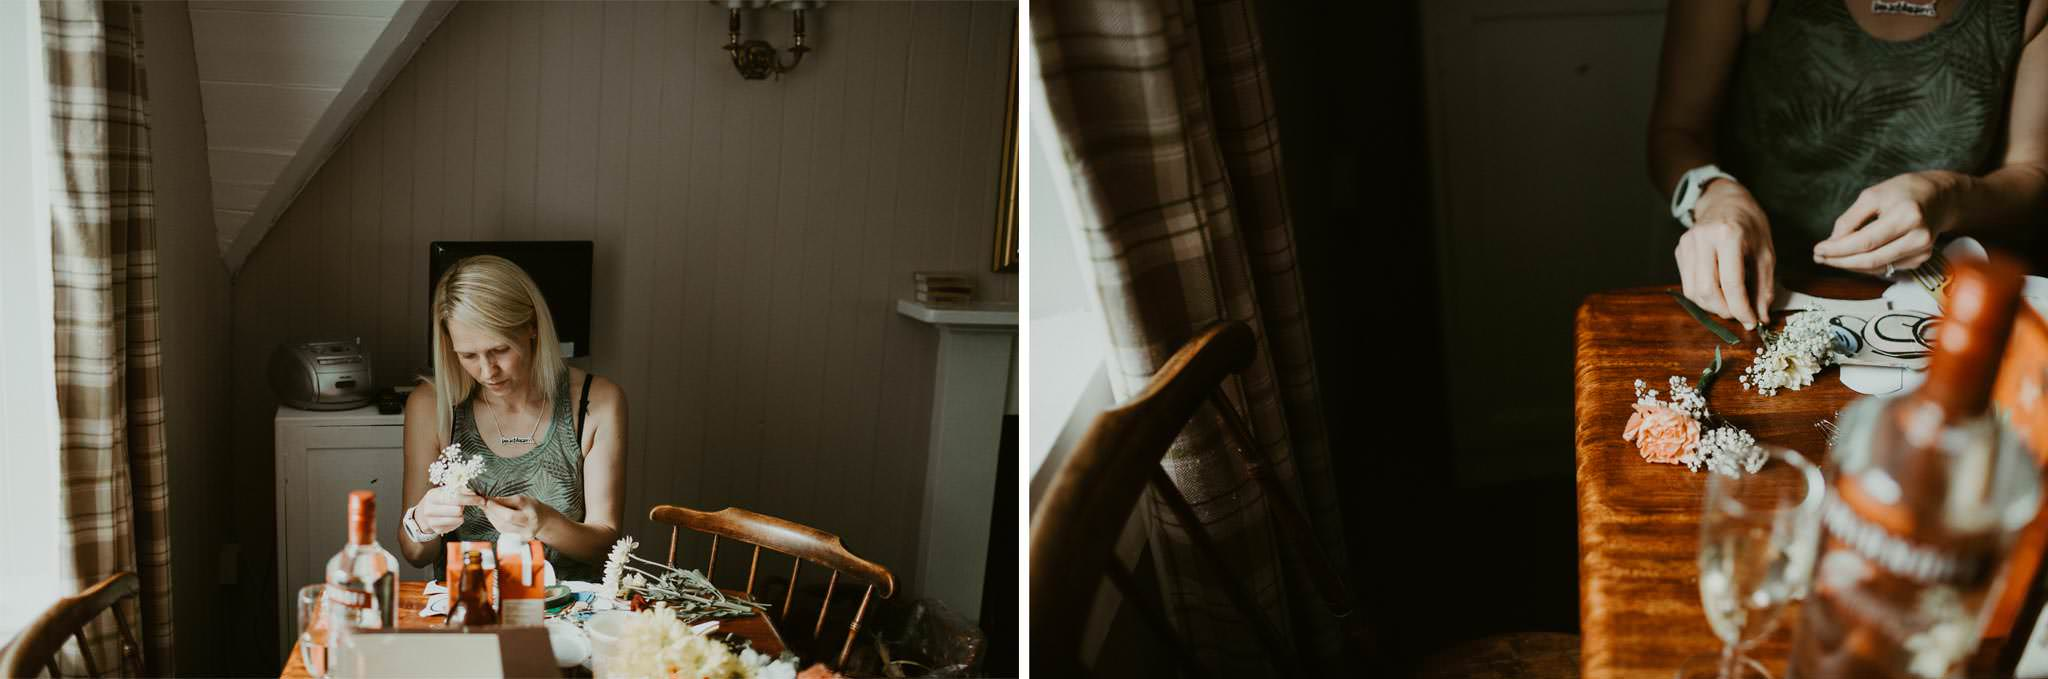 wedding-photographer-arisaig-012